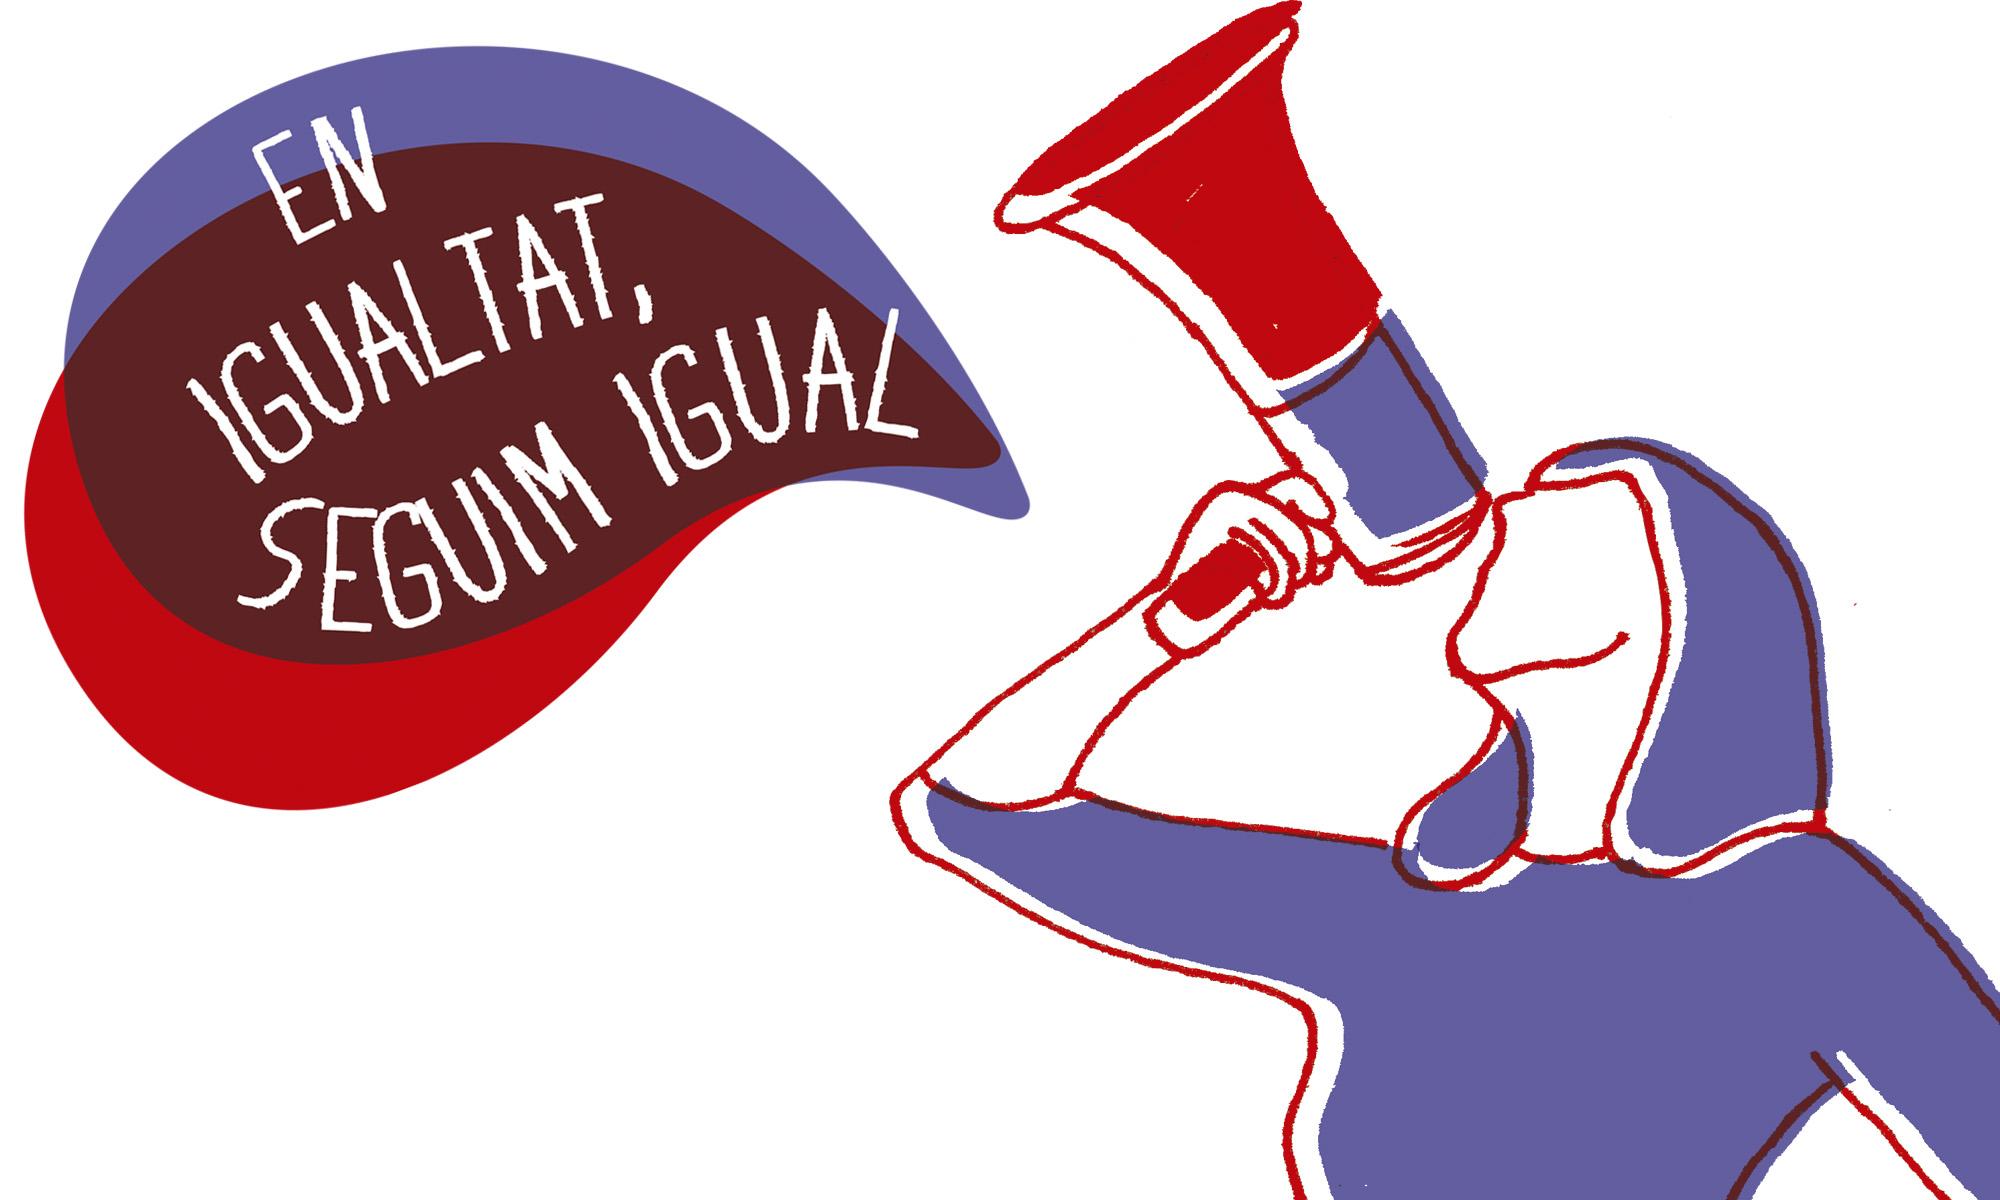 EN IGUALTAT, SEGUIM IGUAL